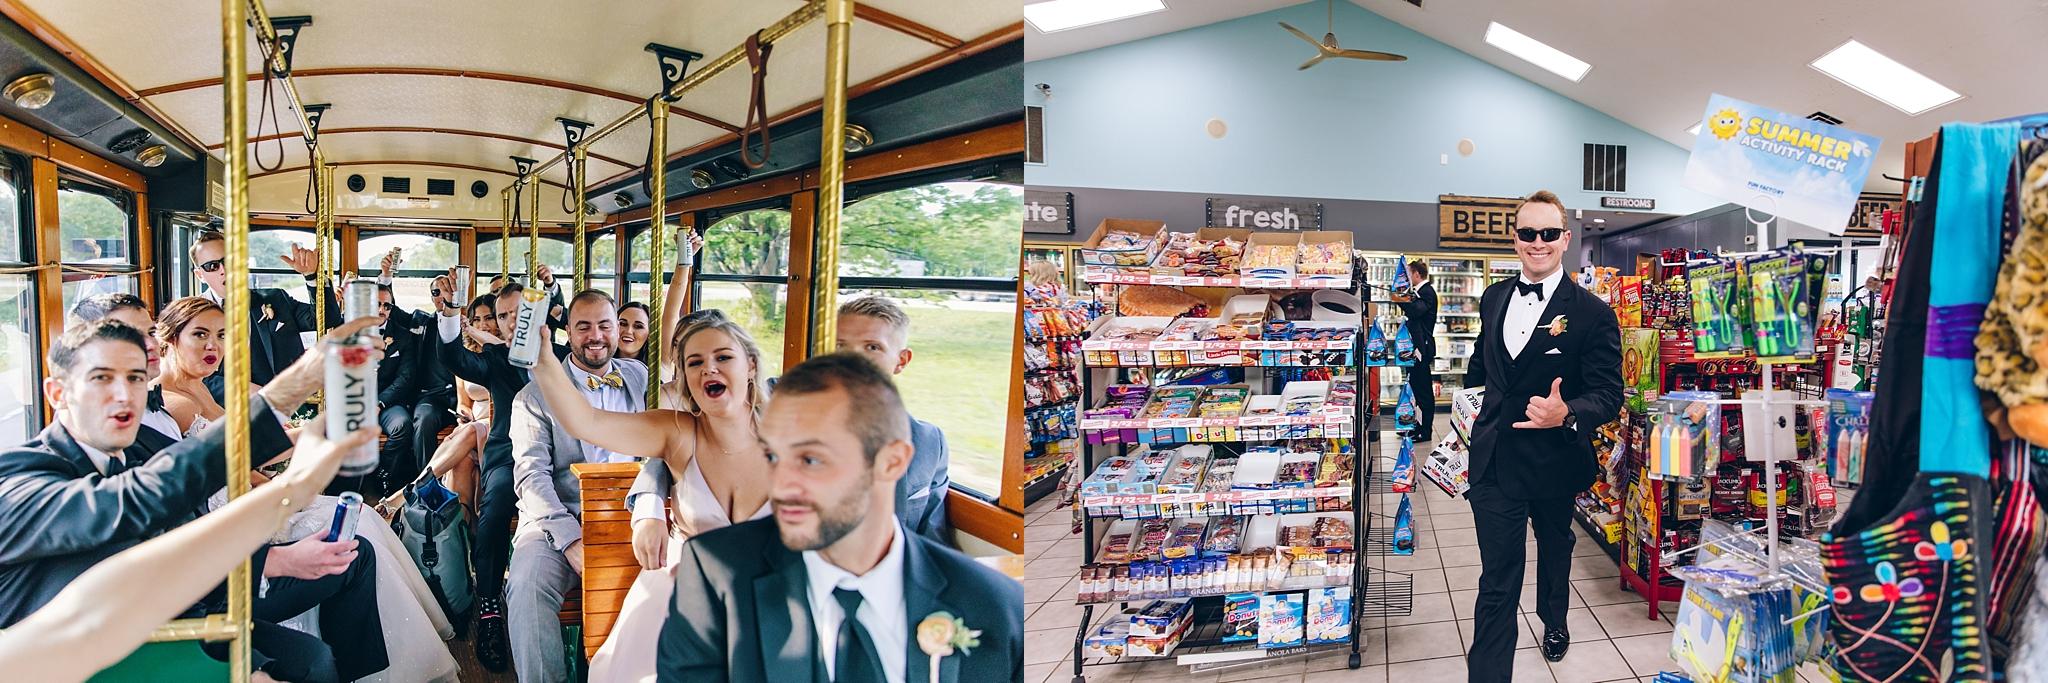 baker-lofts-holland-michigan-wedding-photographer_0371.jpg